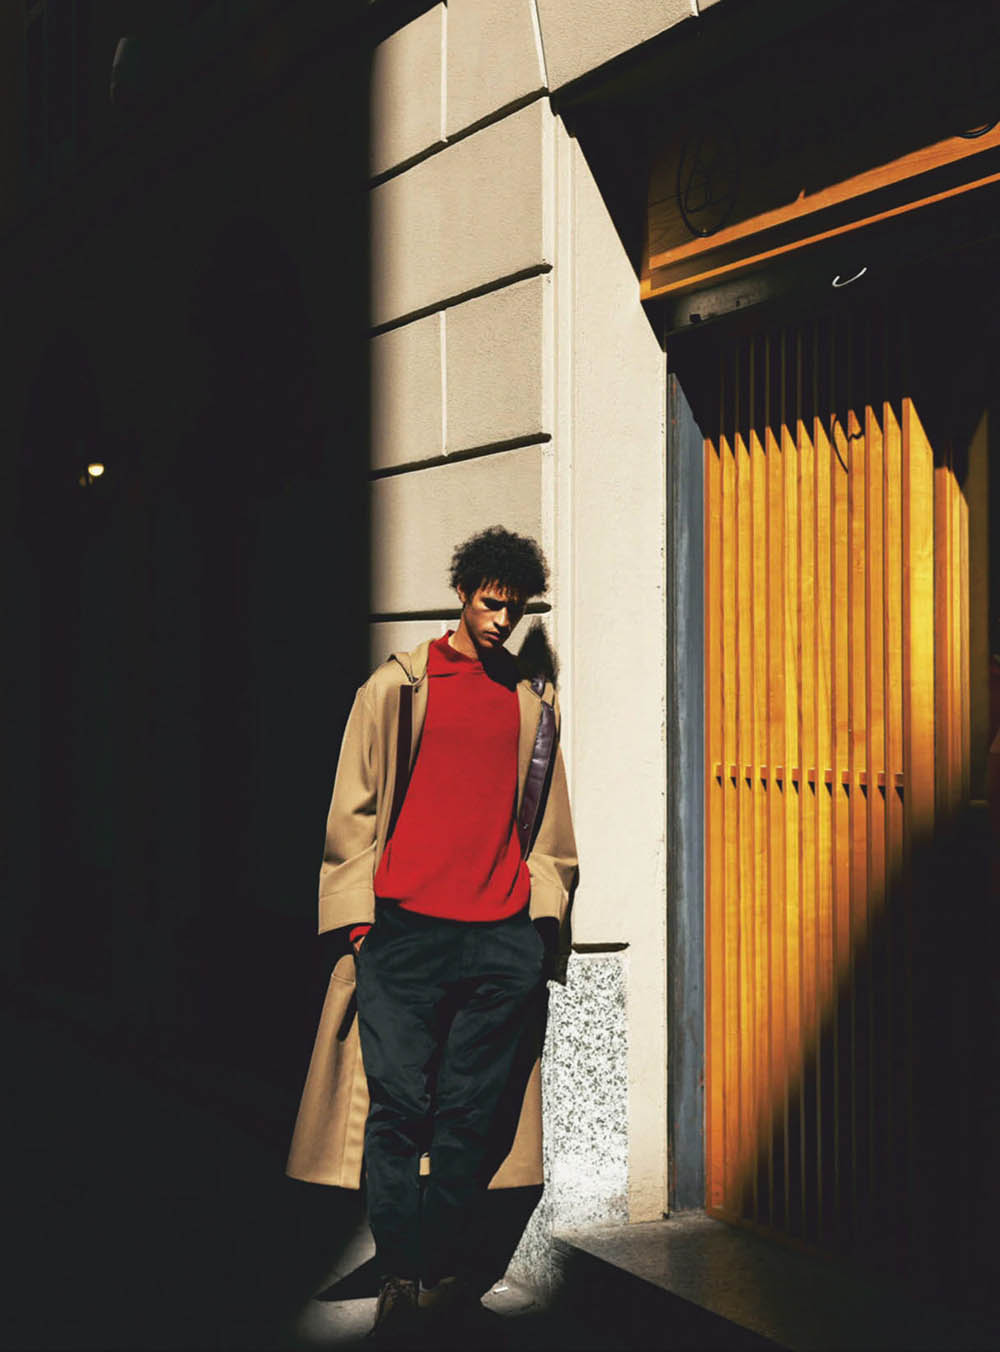 Kaissan Ibrahima by Marko Peros for GQ Mexico October 2019